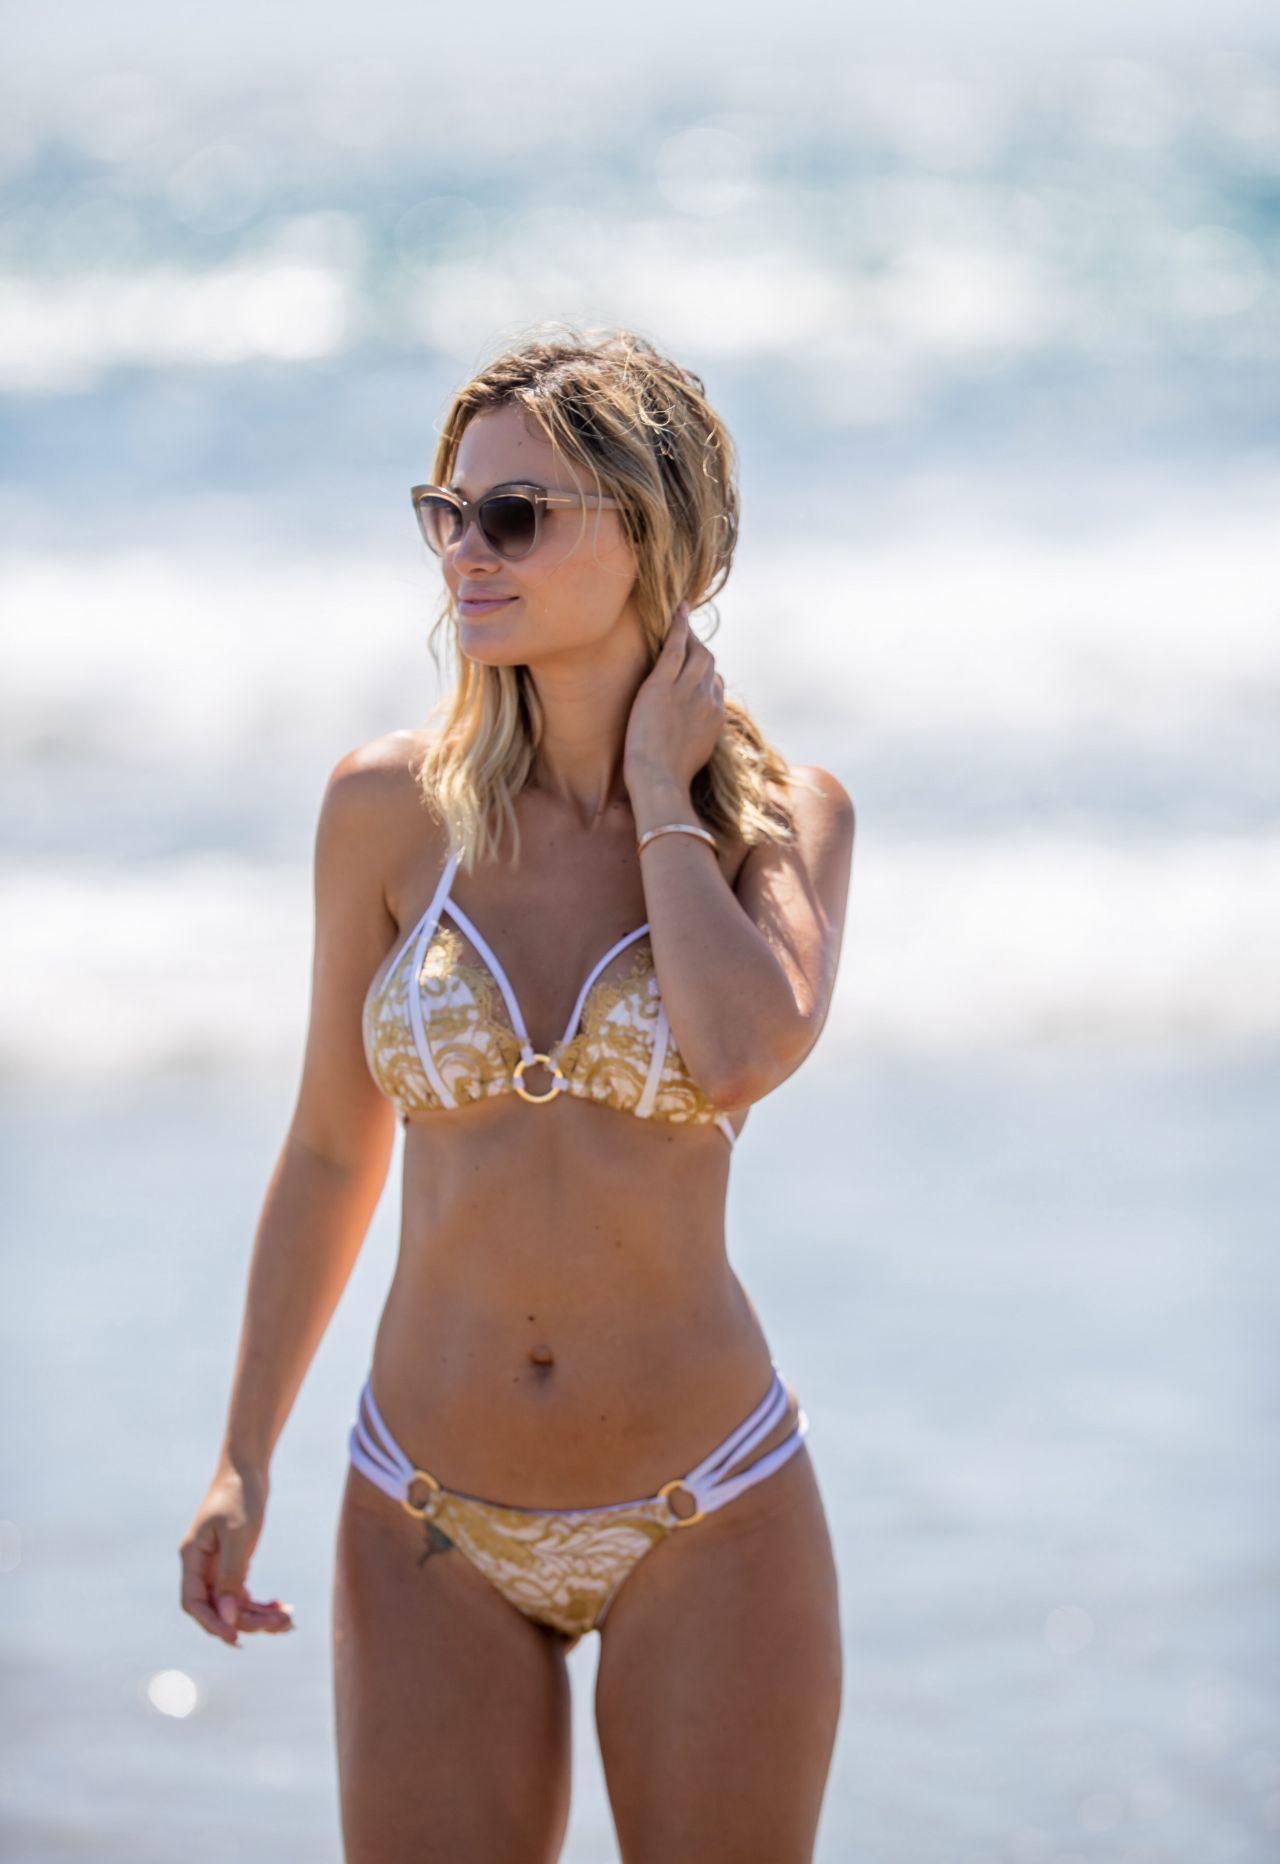 Hot Ella Rose nudes (44 foto and video), Tits, Paparazzi, Instagram, underwear 2018